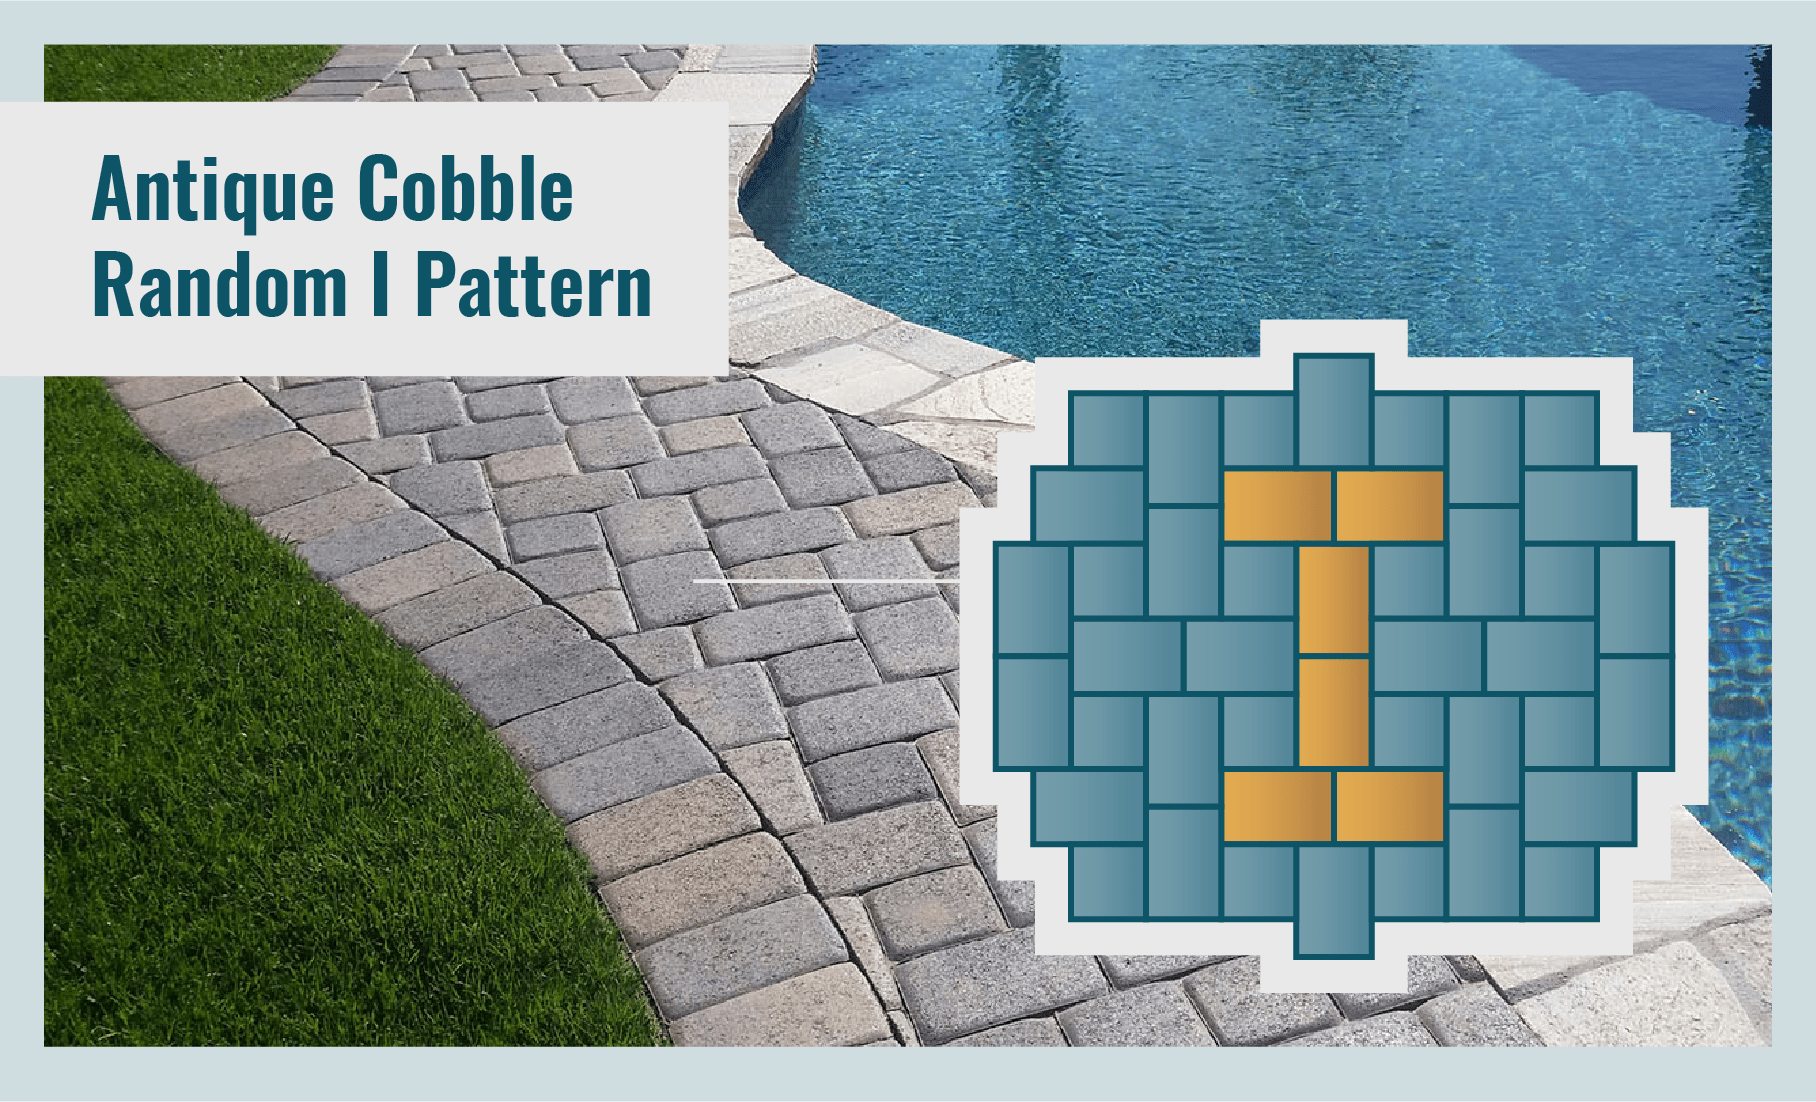 Antique Cobble Random I Paver Laying Pattern